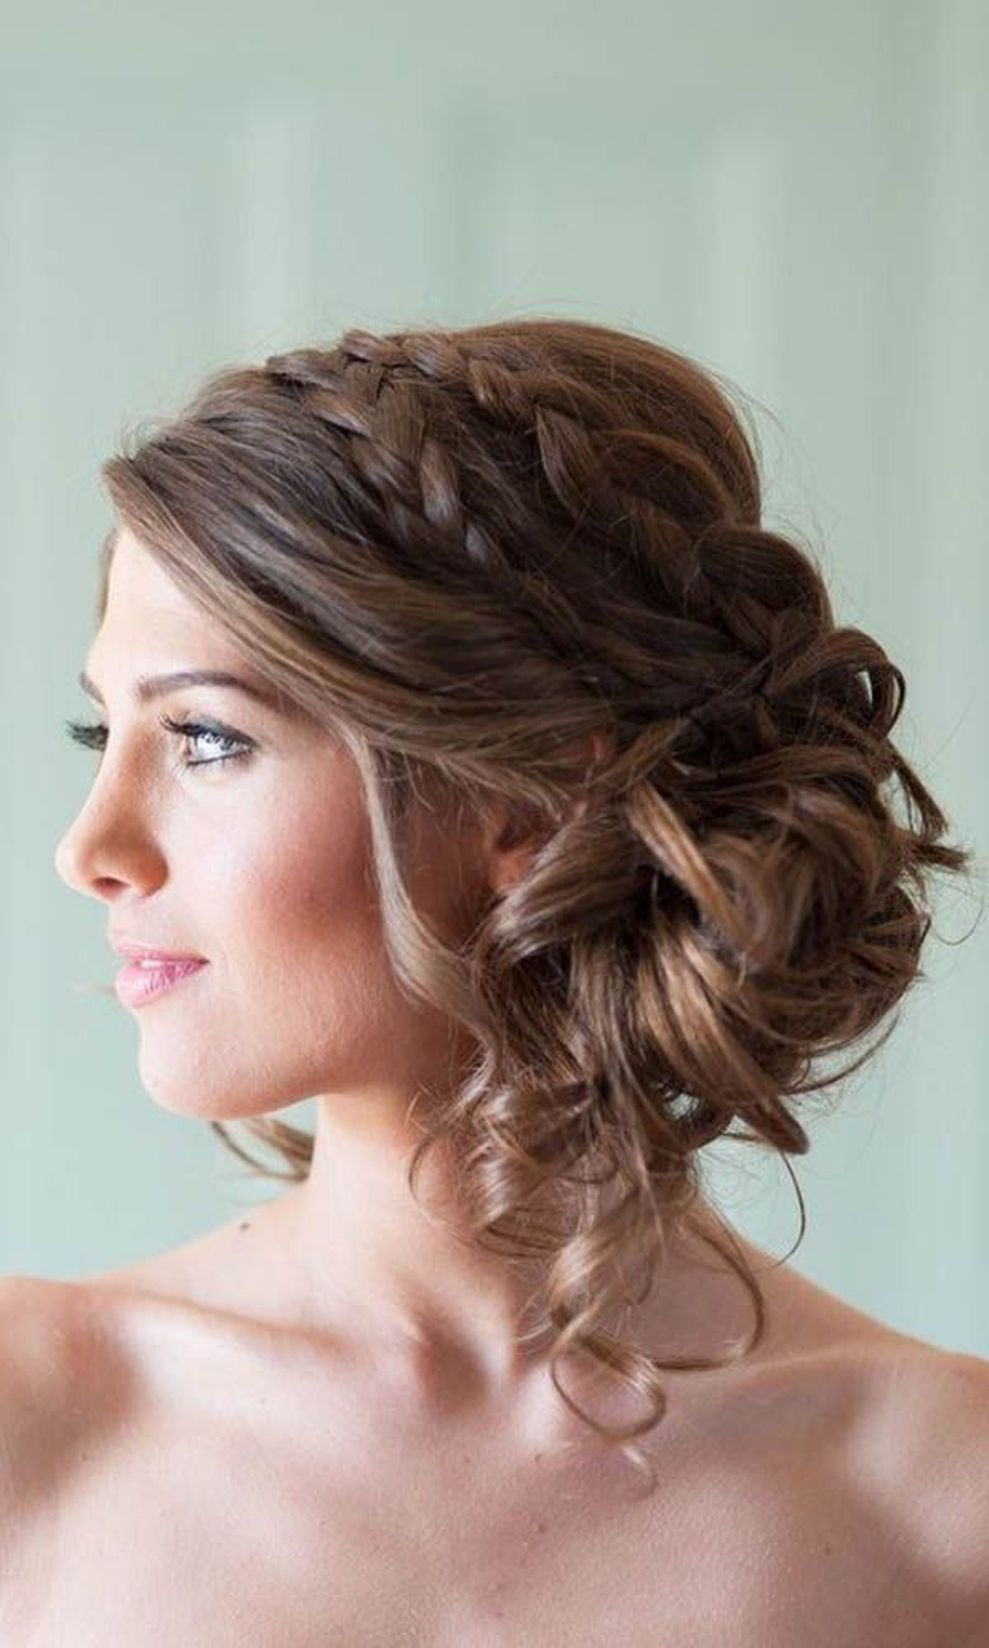 barbie games hairstyle   prom   hair styles, wedding